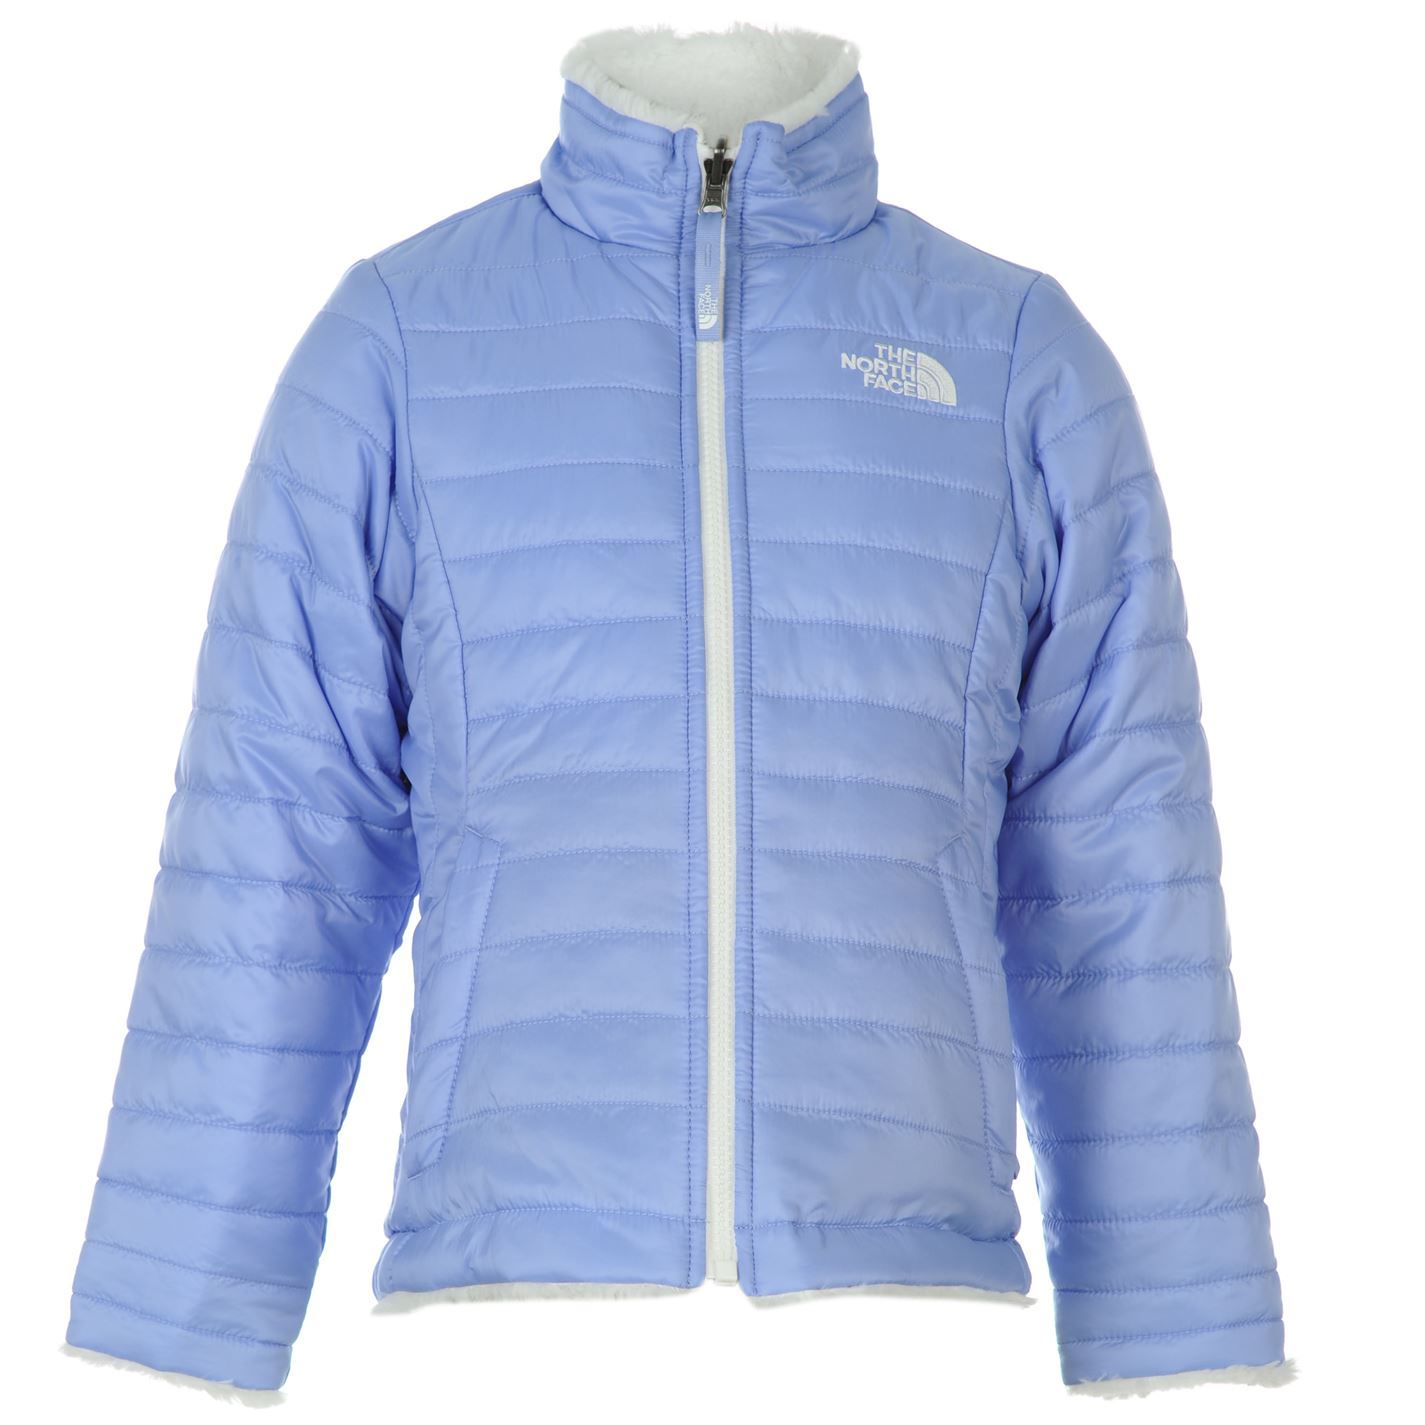 The North Face Kids Children Juniors Reversible Jacket